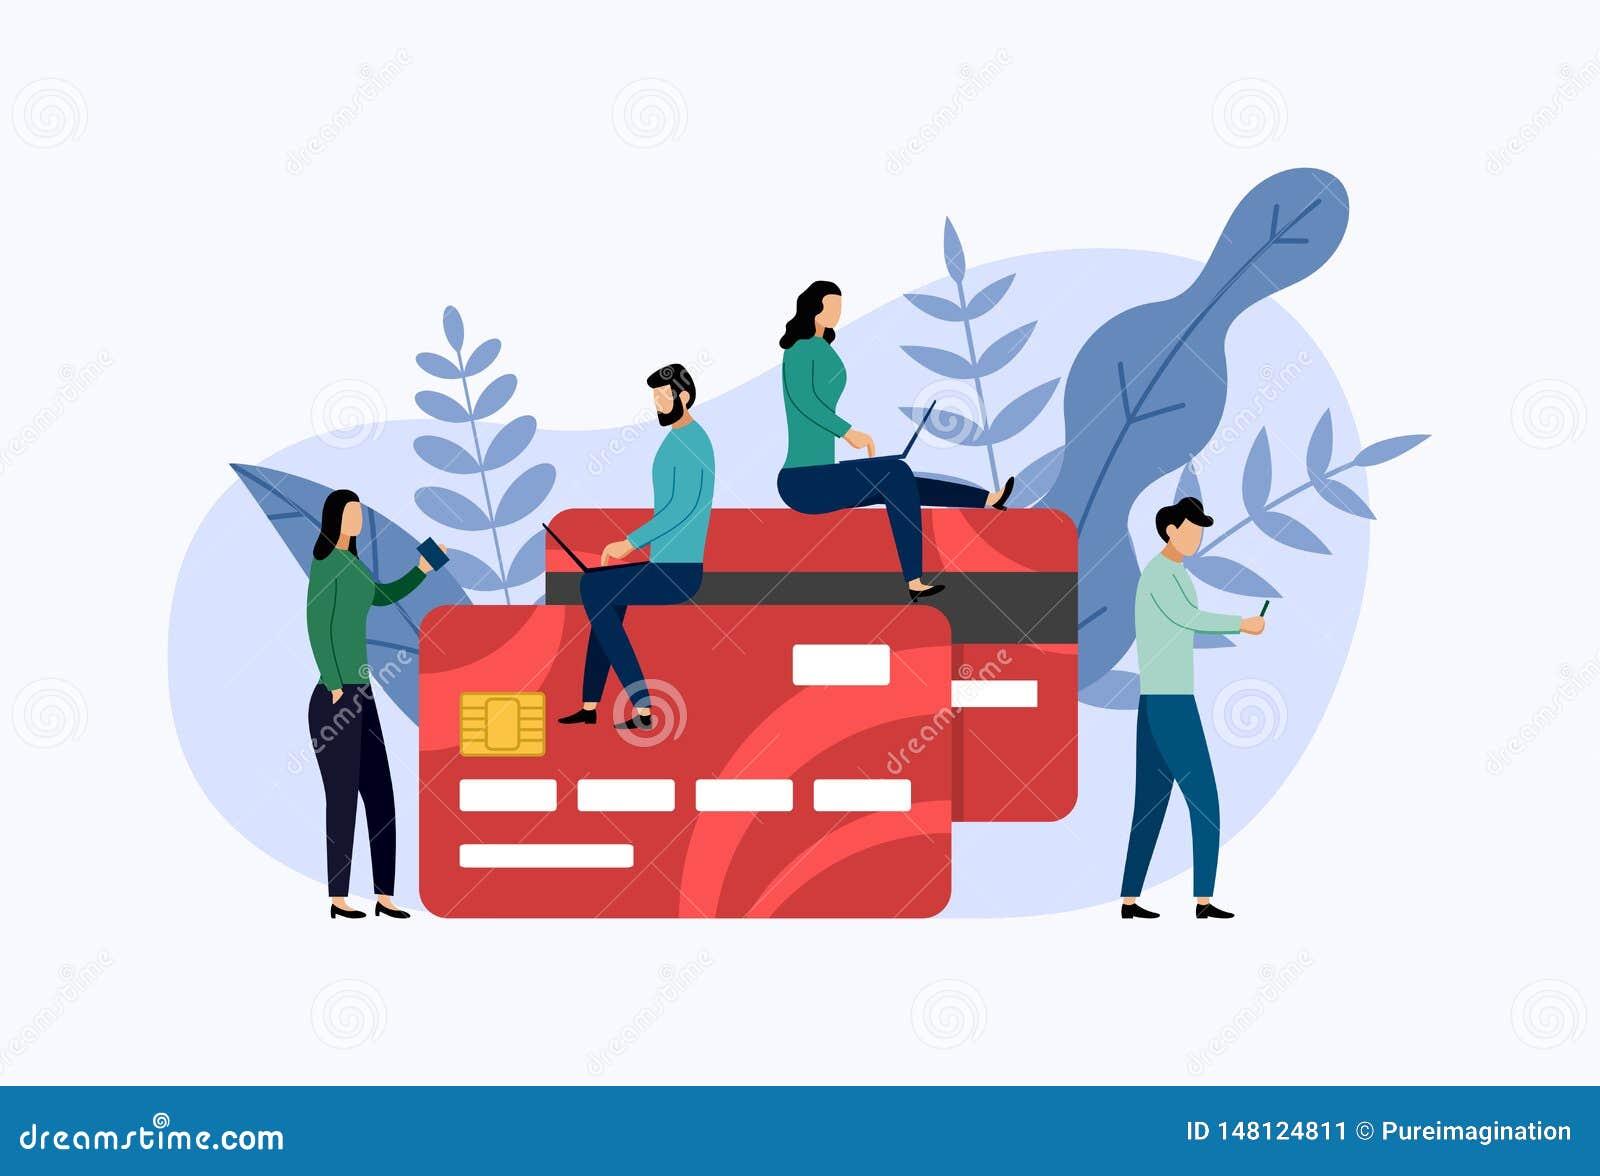 Debit or credit card payment